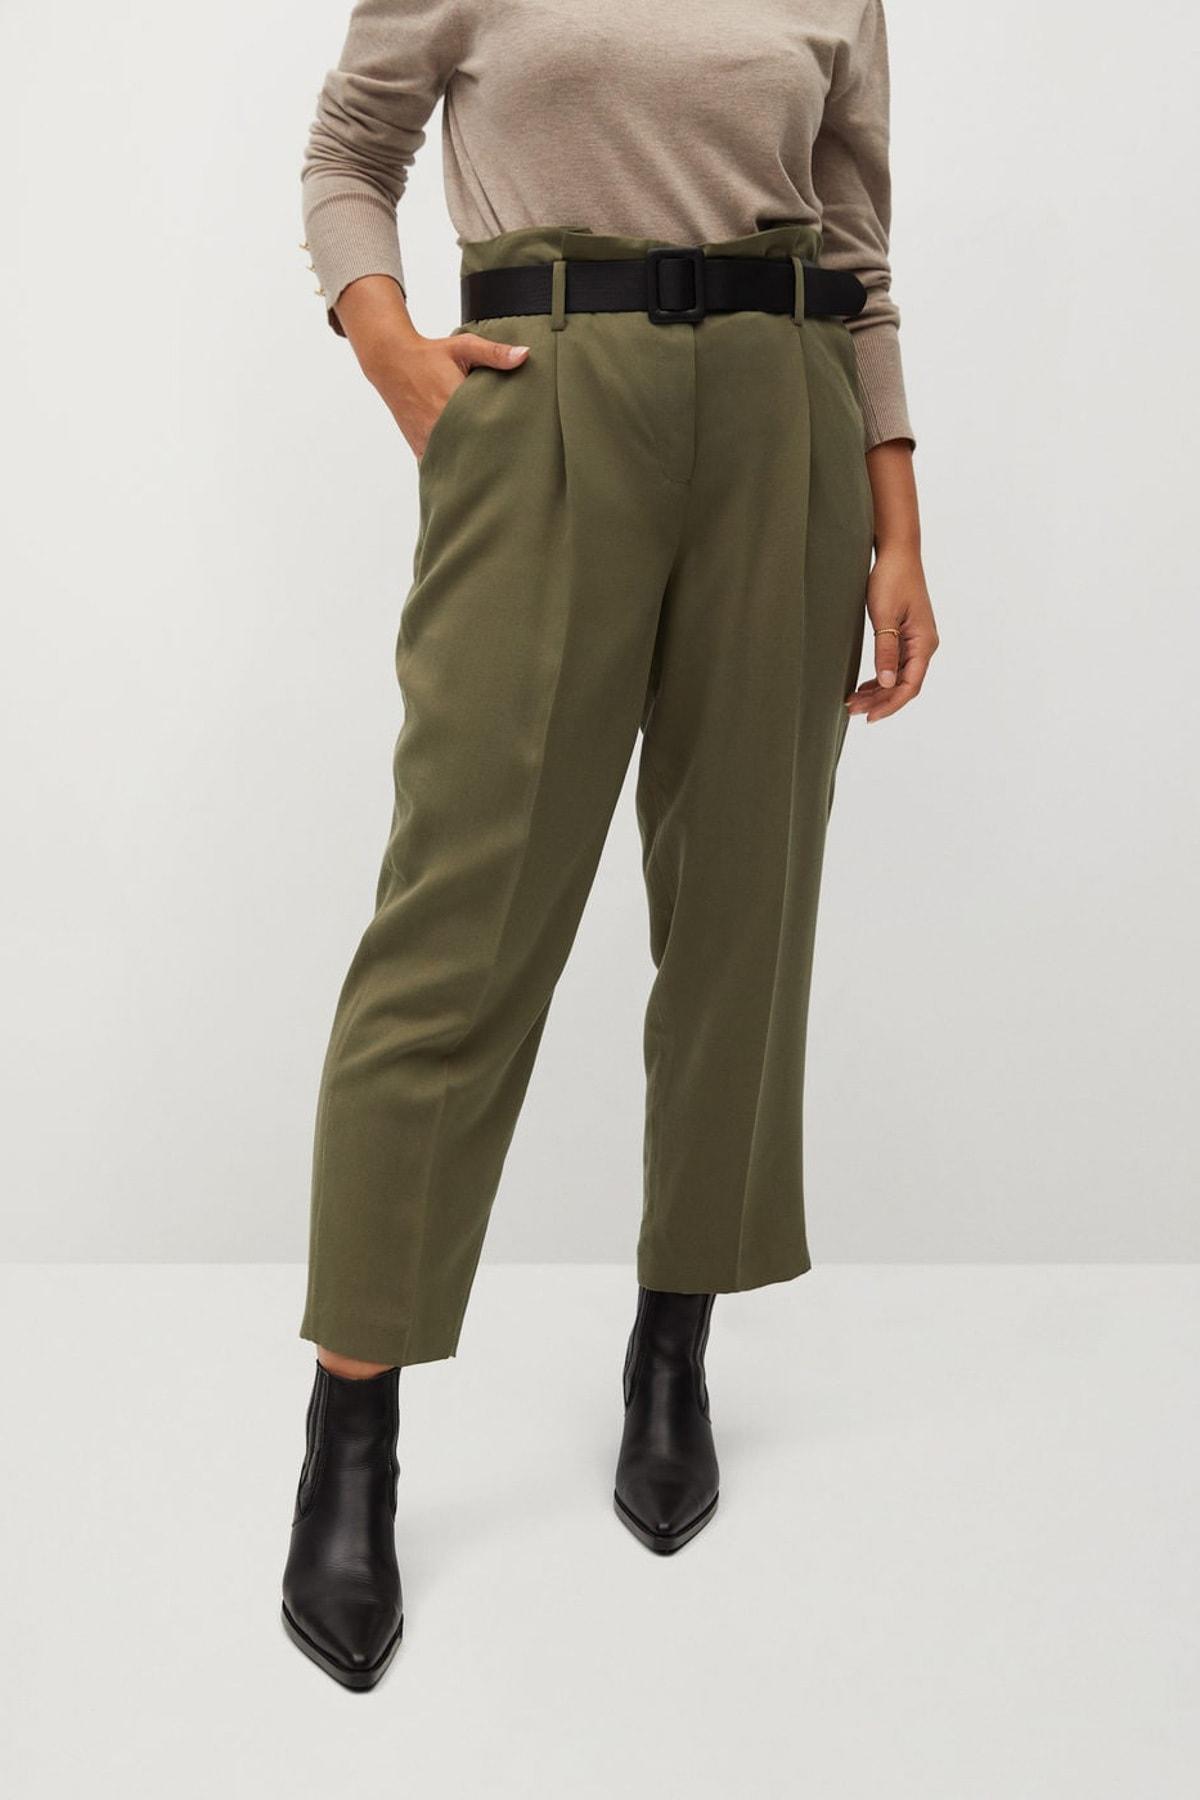 Violeta by MANGO Kadın Haki Renk Daralan Kısa Paçalı Pantolon 77067110 2